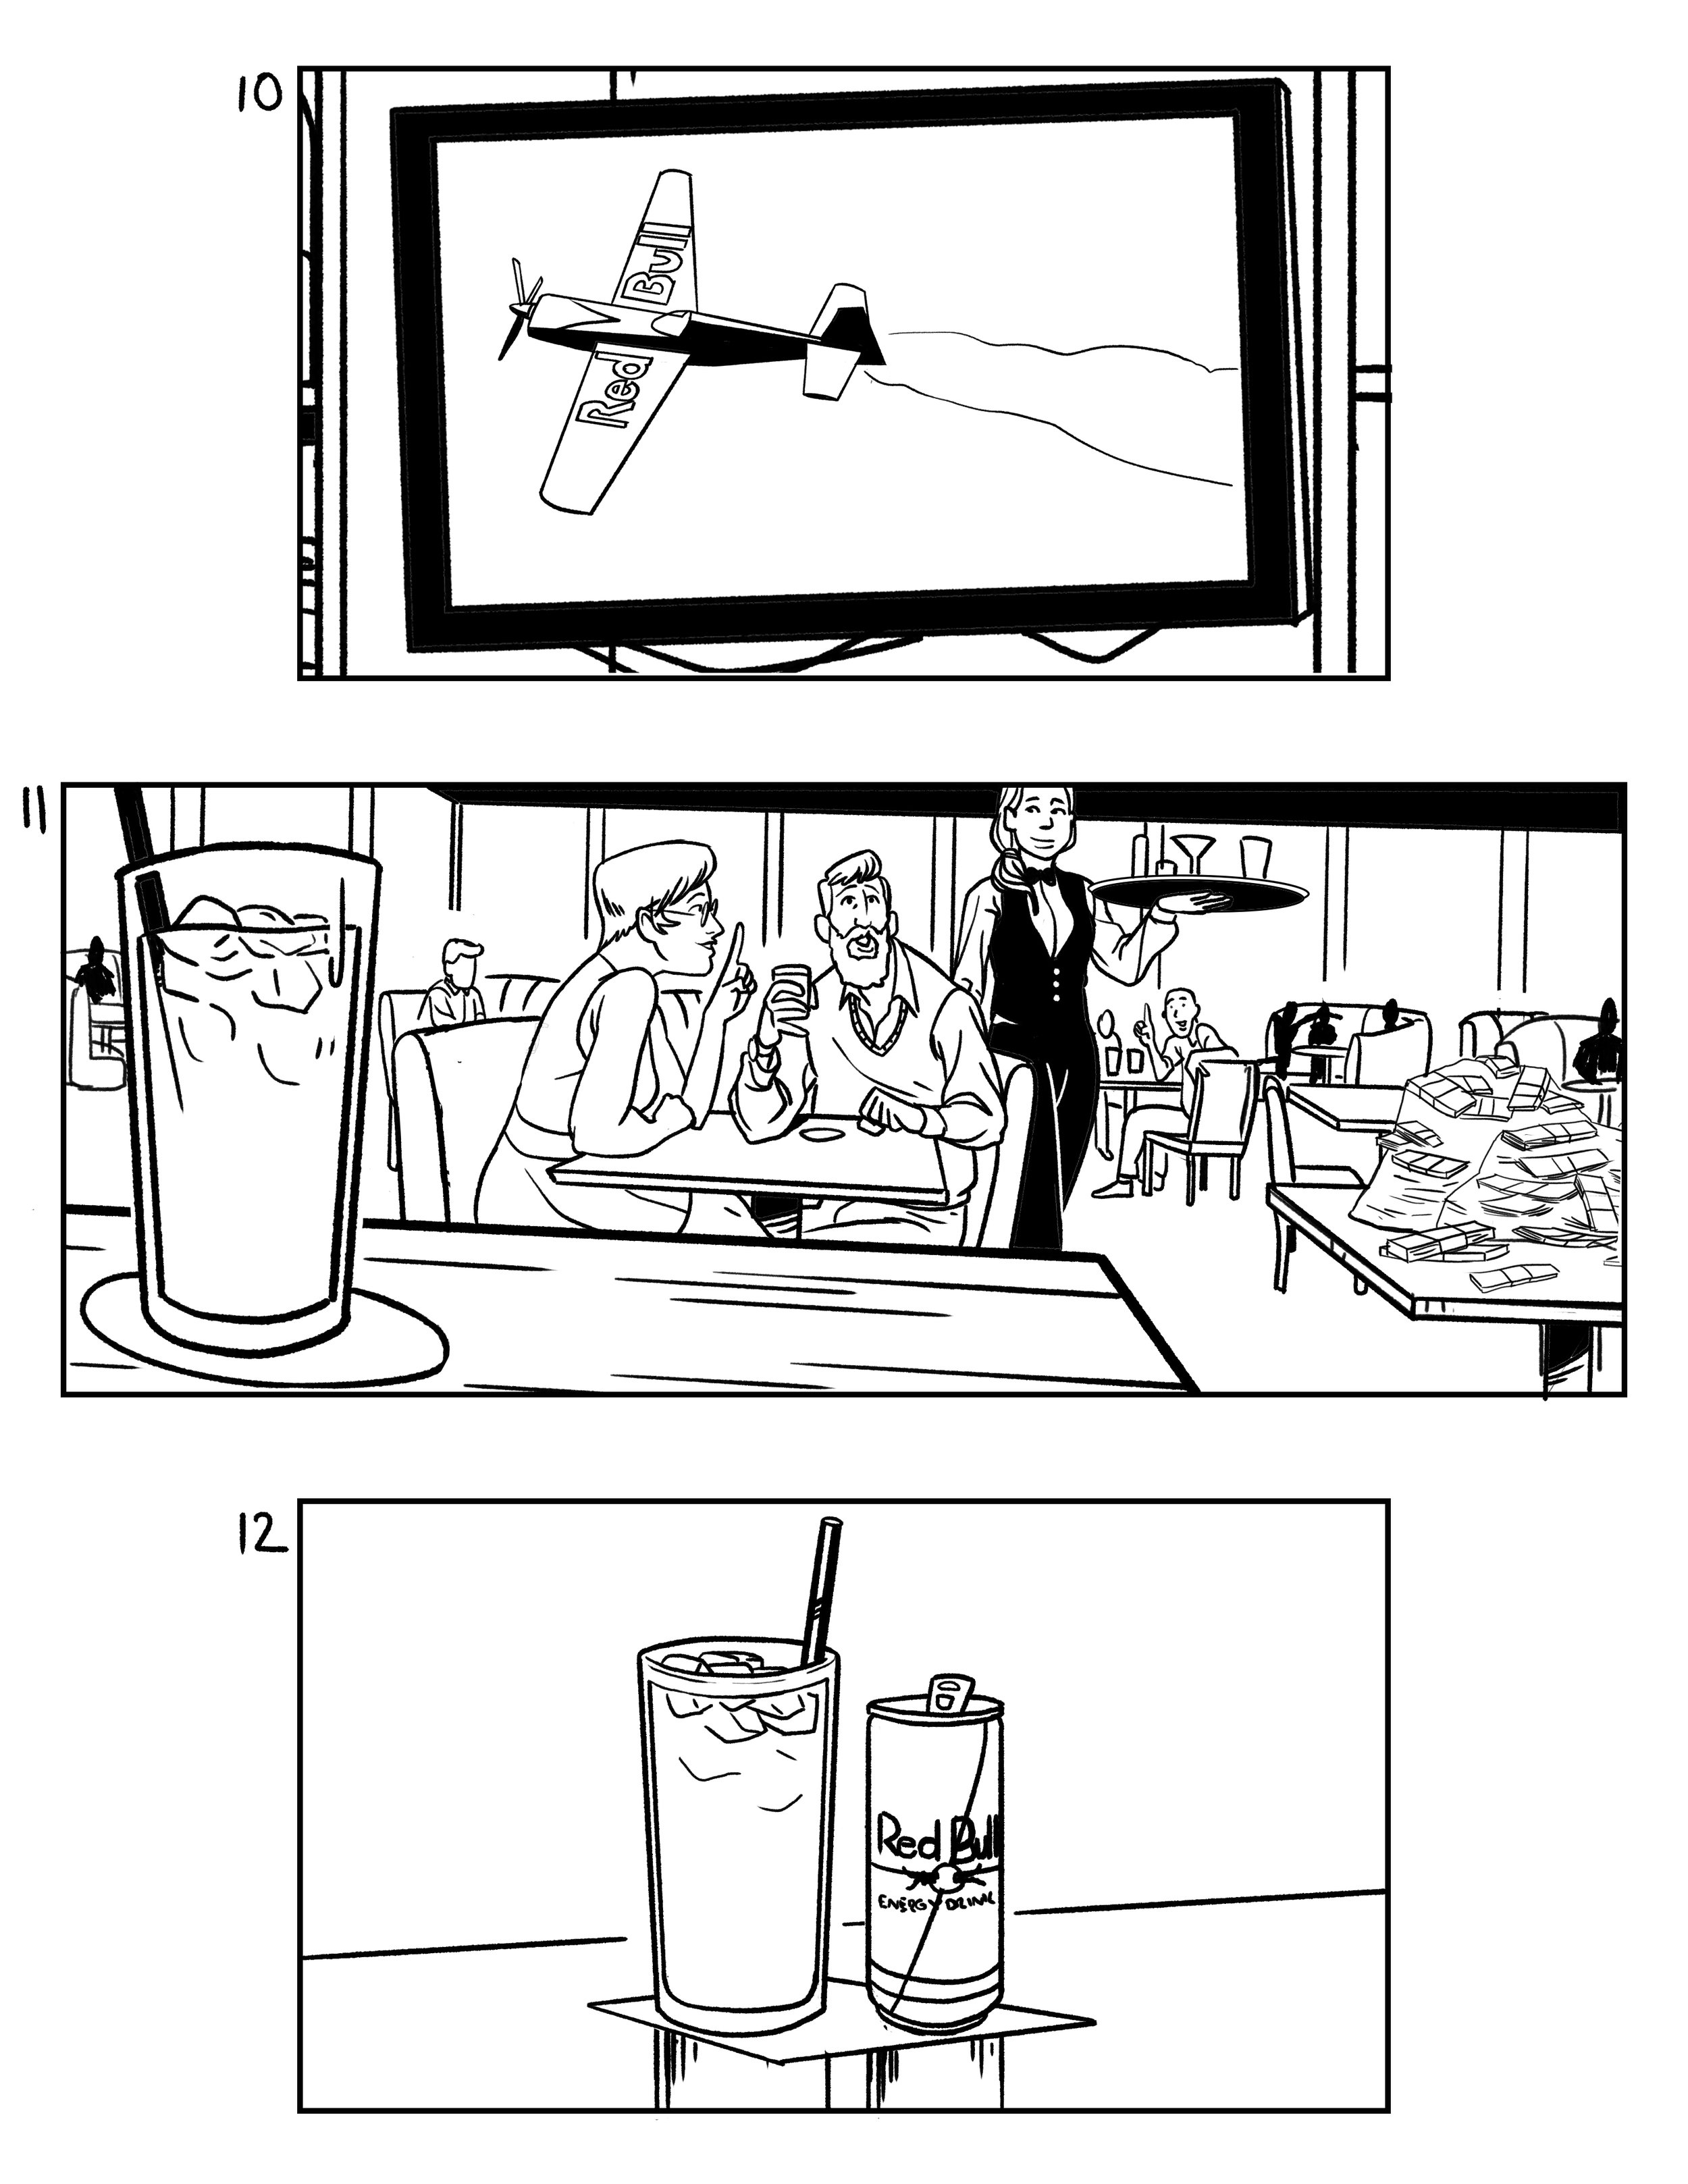 FF_StoryboardTest_4.jpg